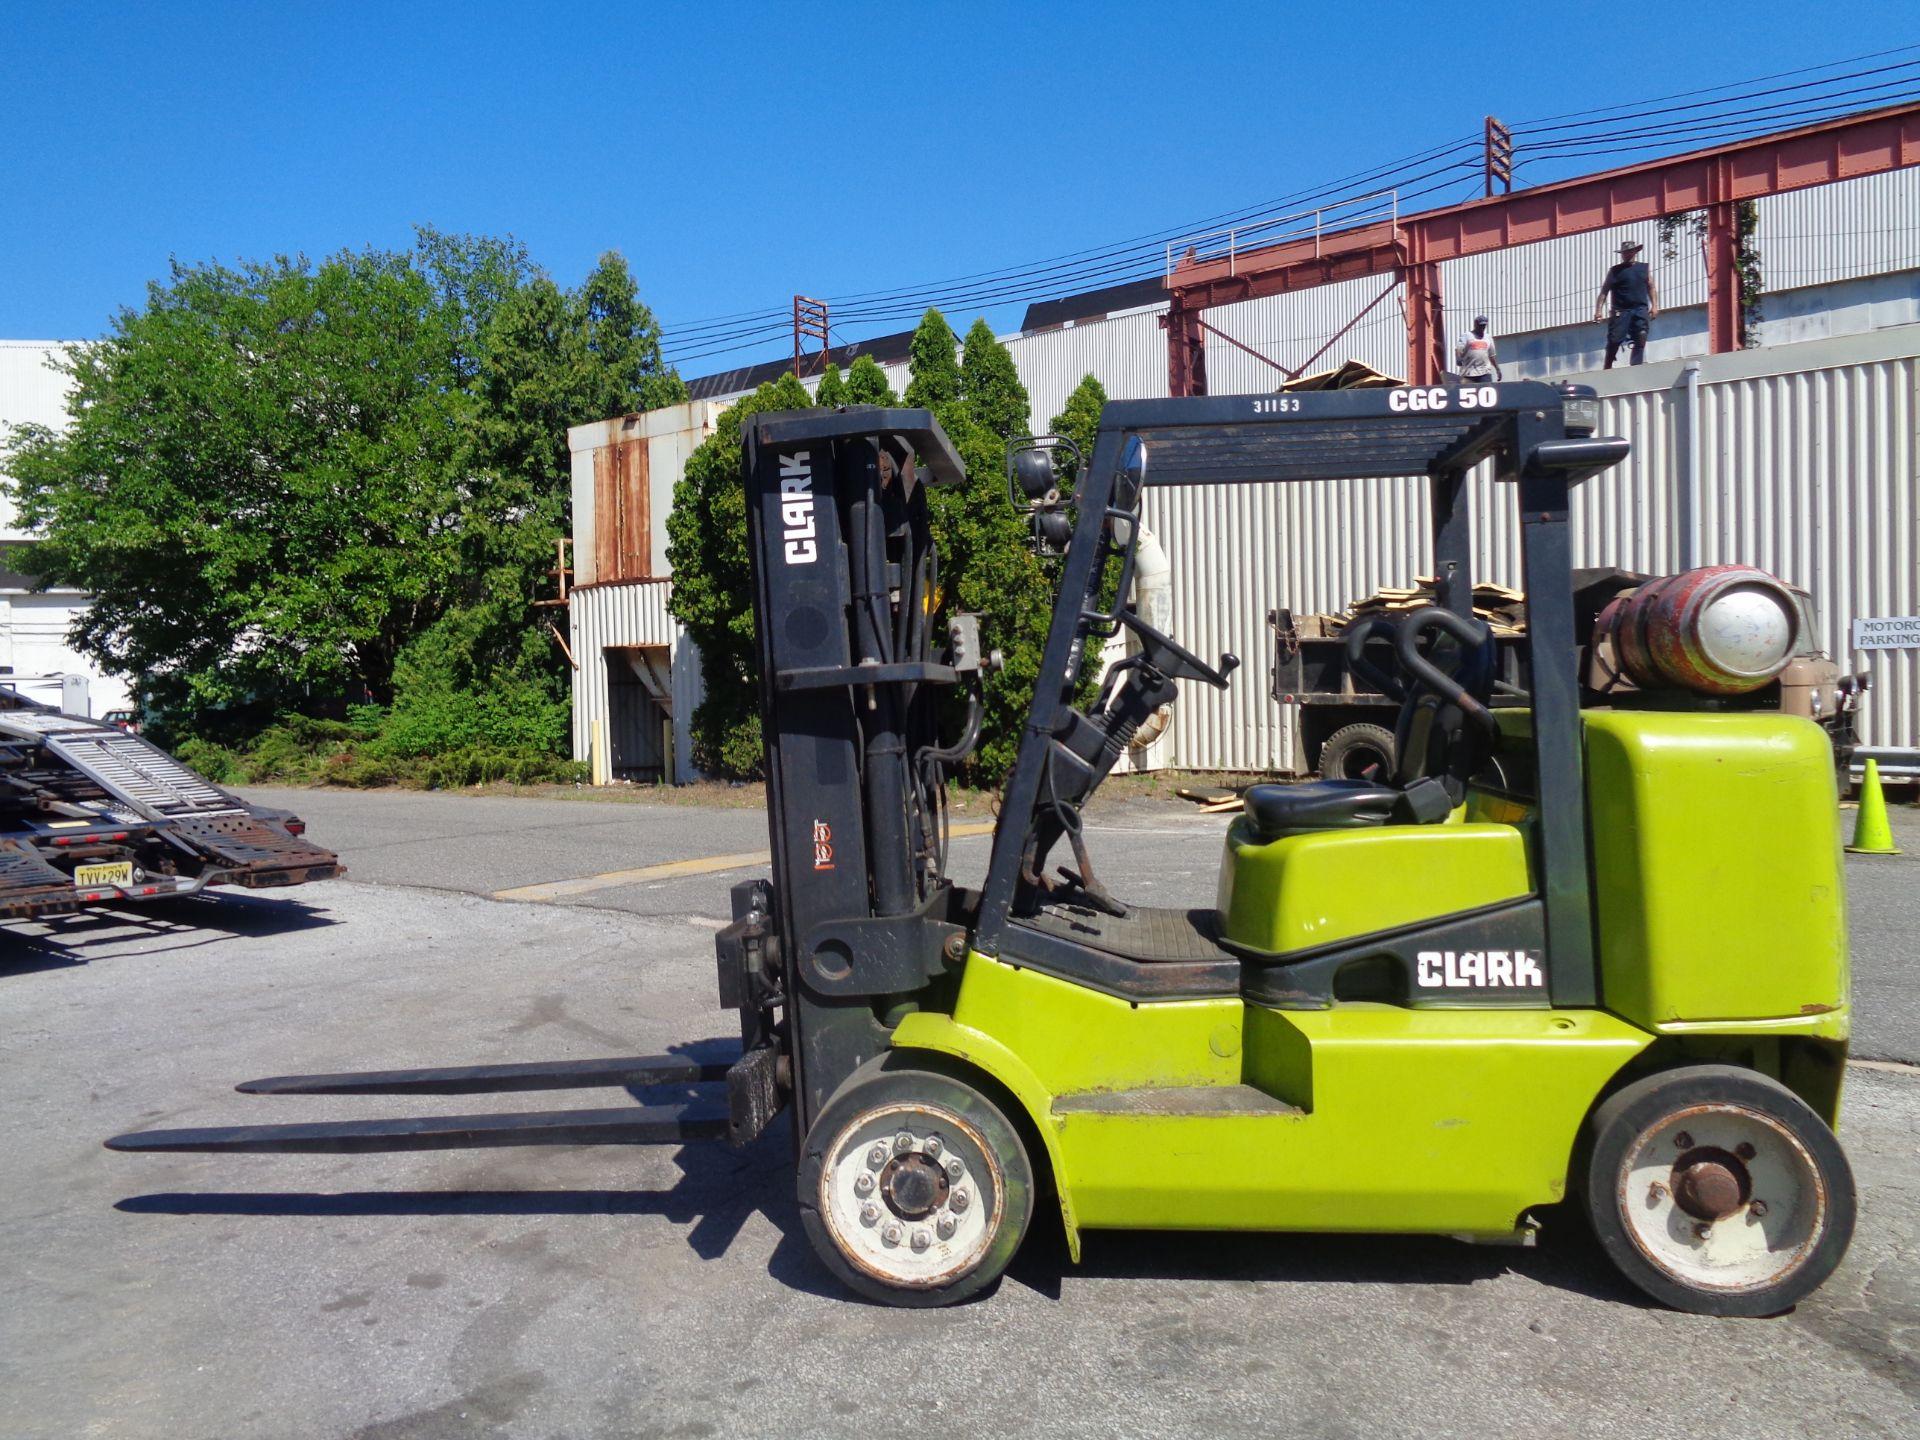 2014 Clark CGC500 10,000 lb Forklift - Image 2 of 12